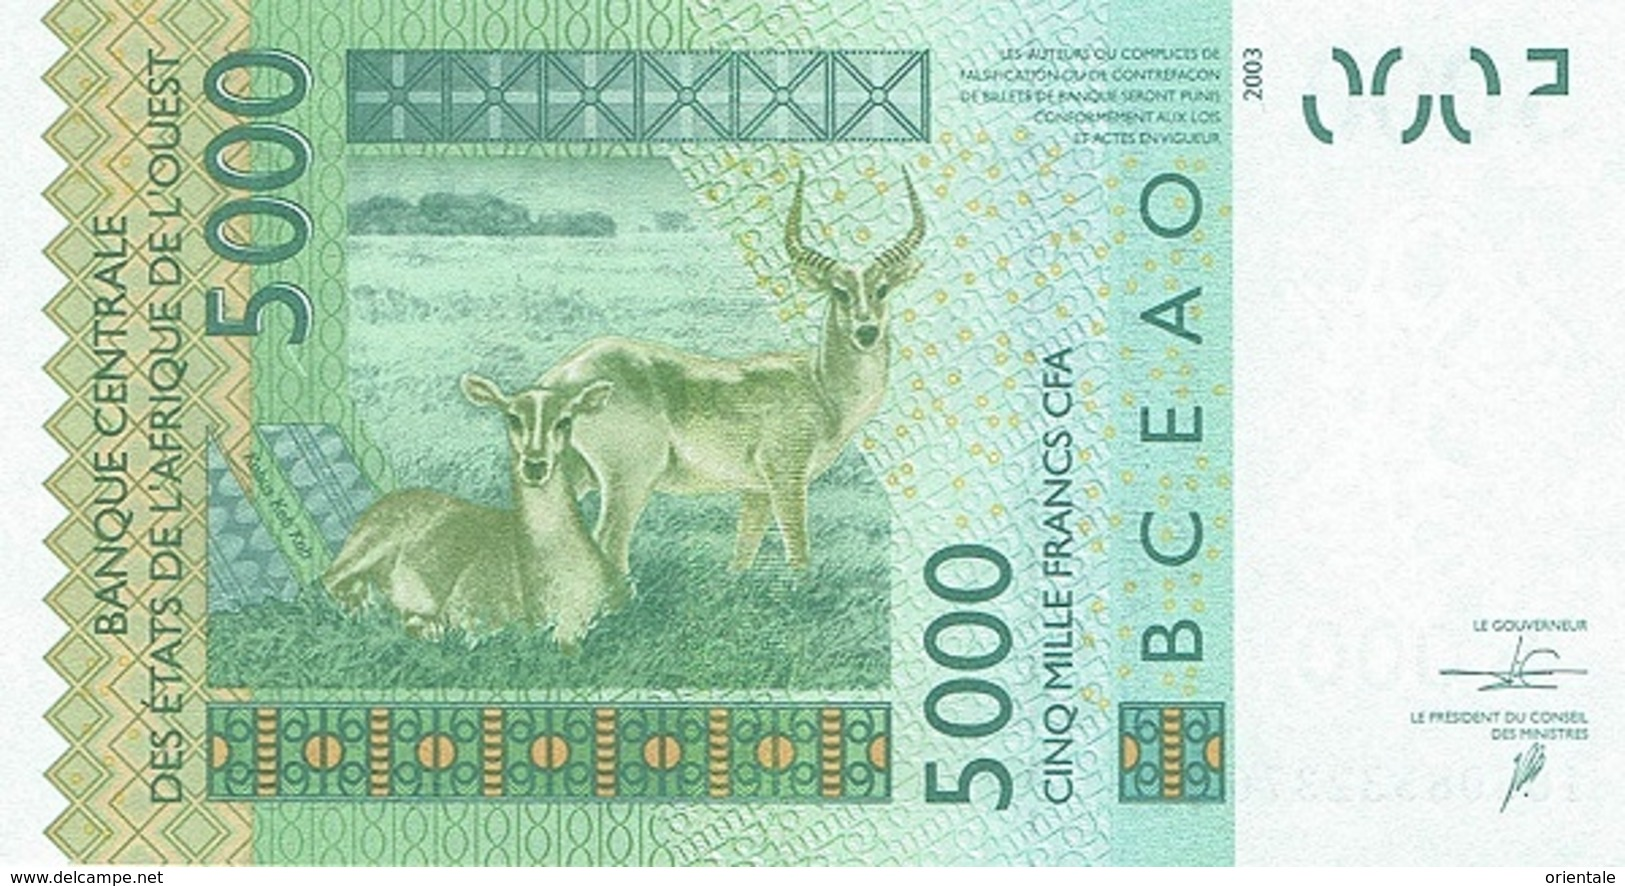 WEST AFRICAN STATES P. 717Ko 5000 F 2016 UNC - Sénégal